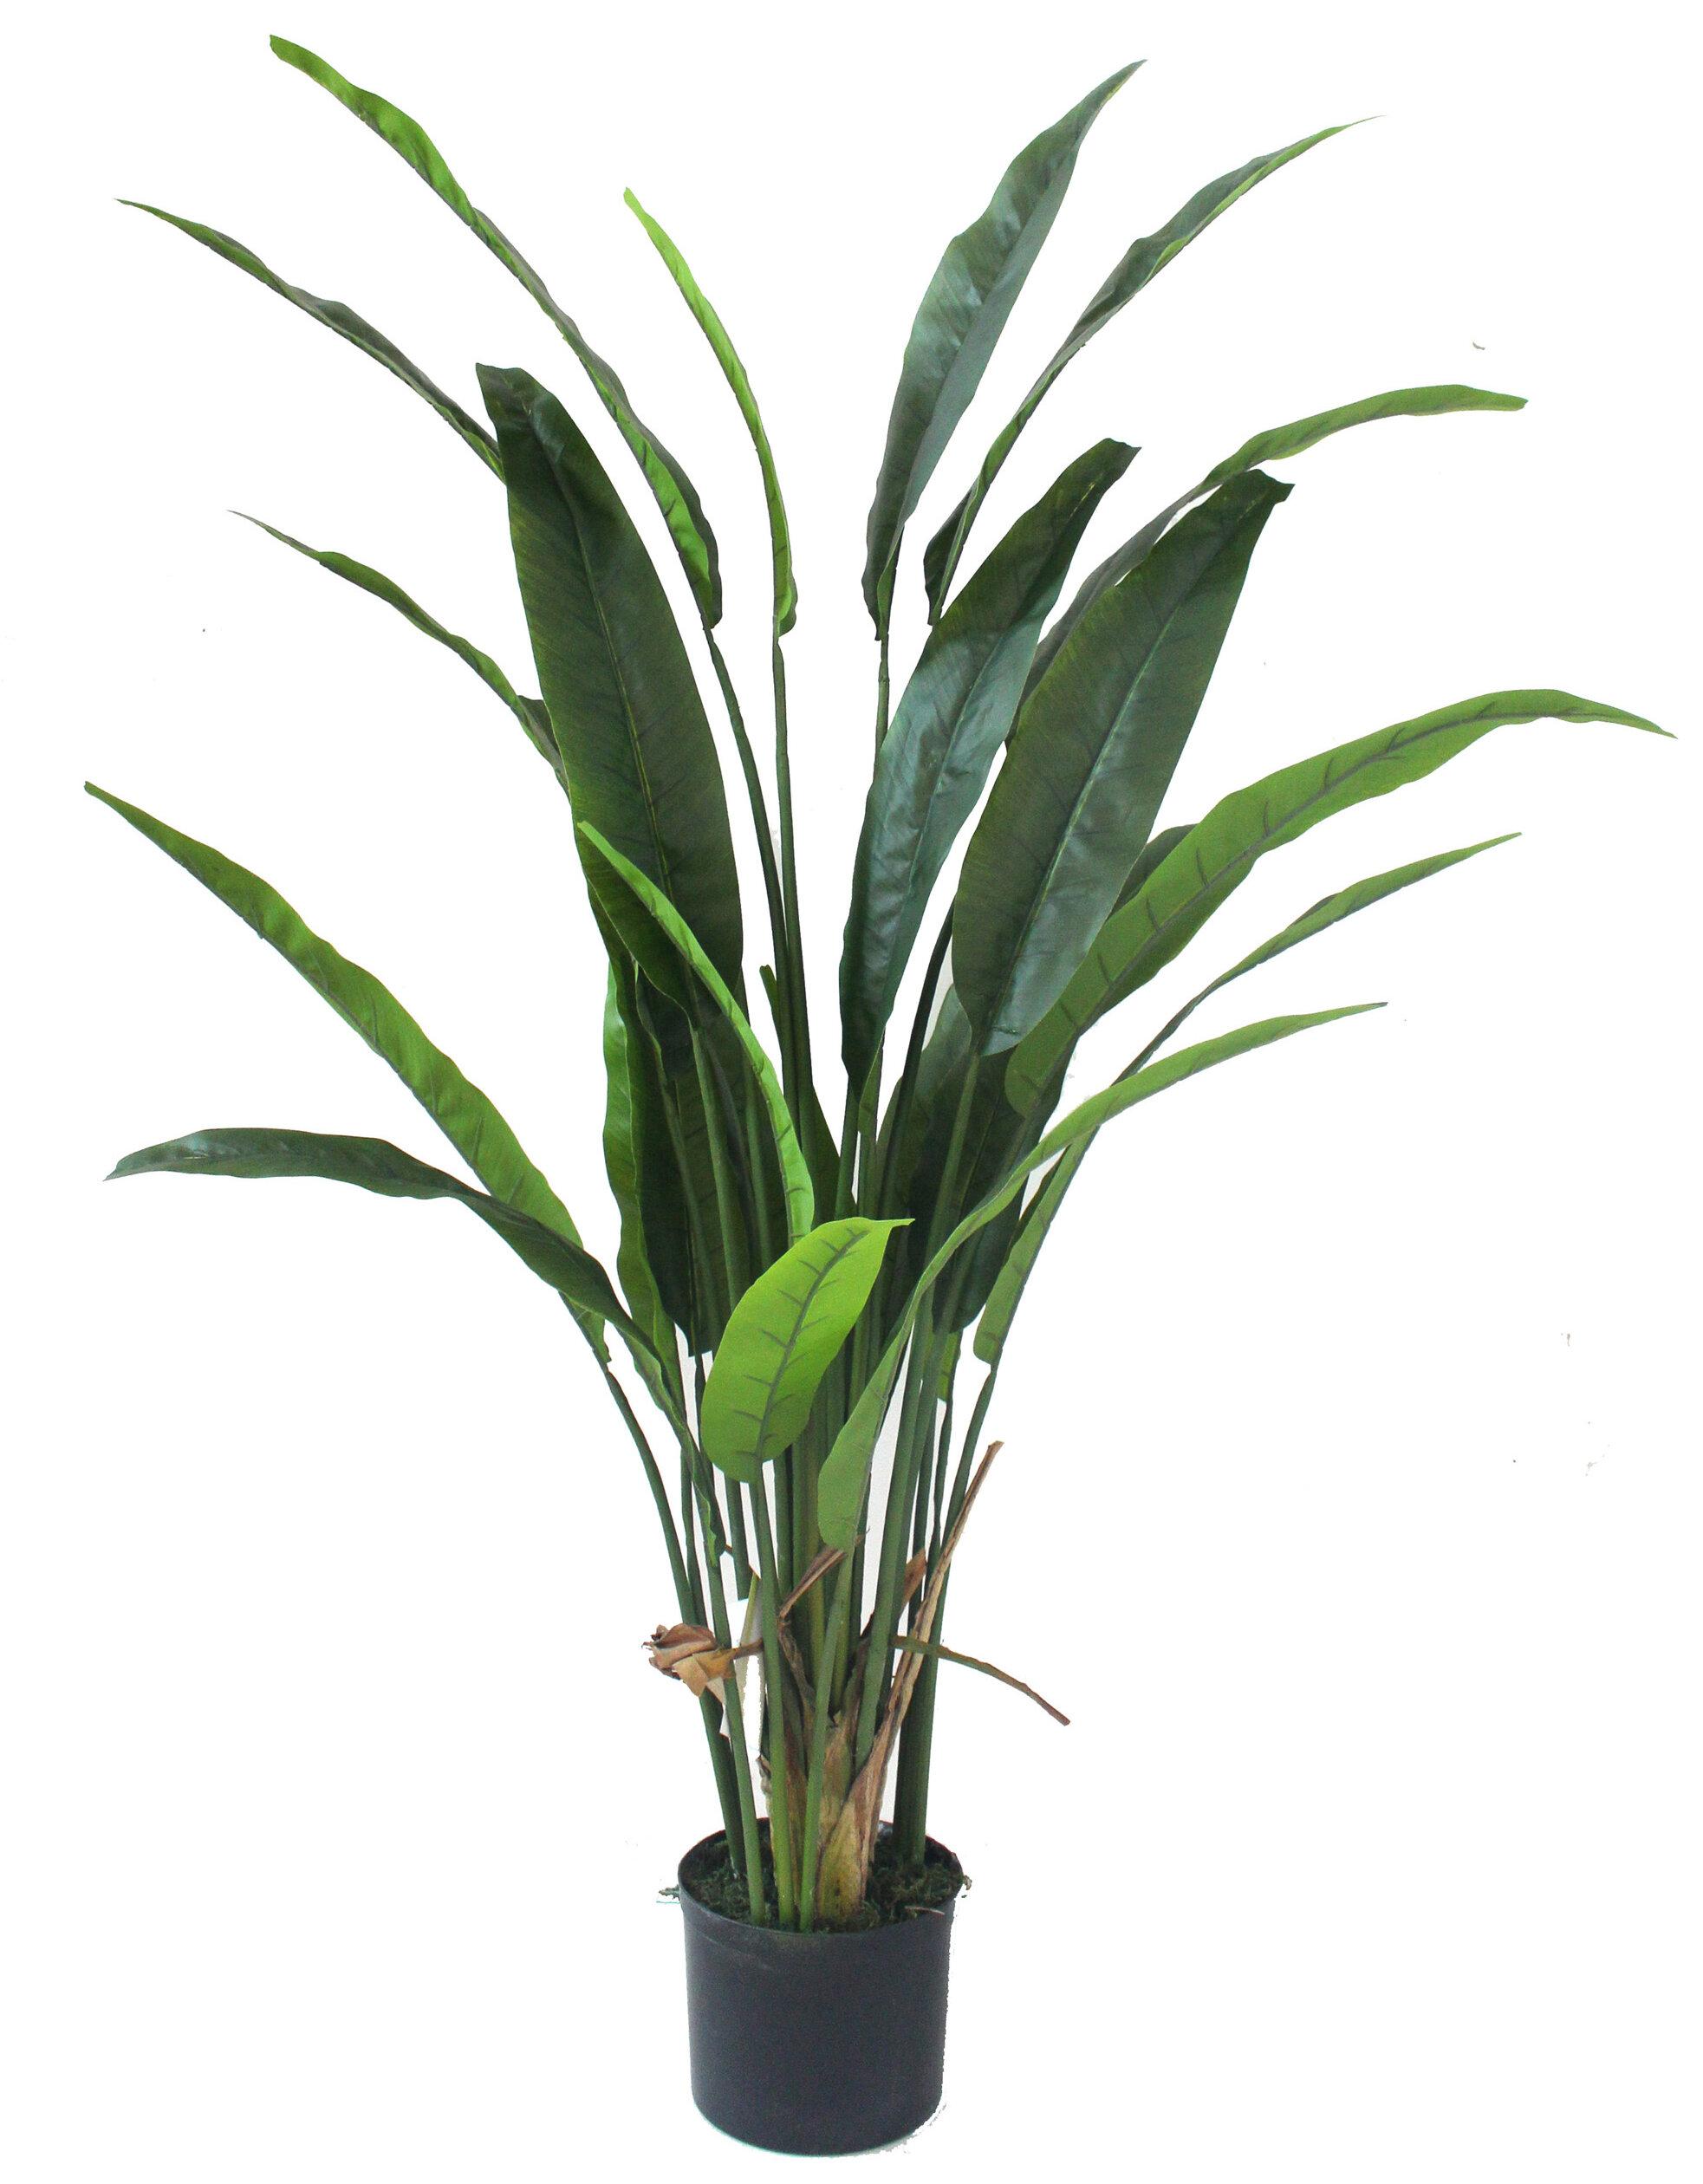 Bird Of Paradise Silk Palm Plant In Pot